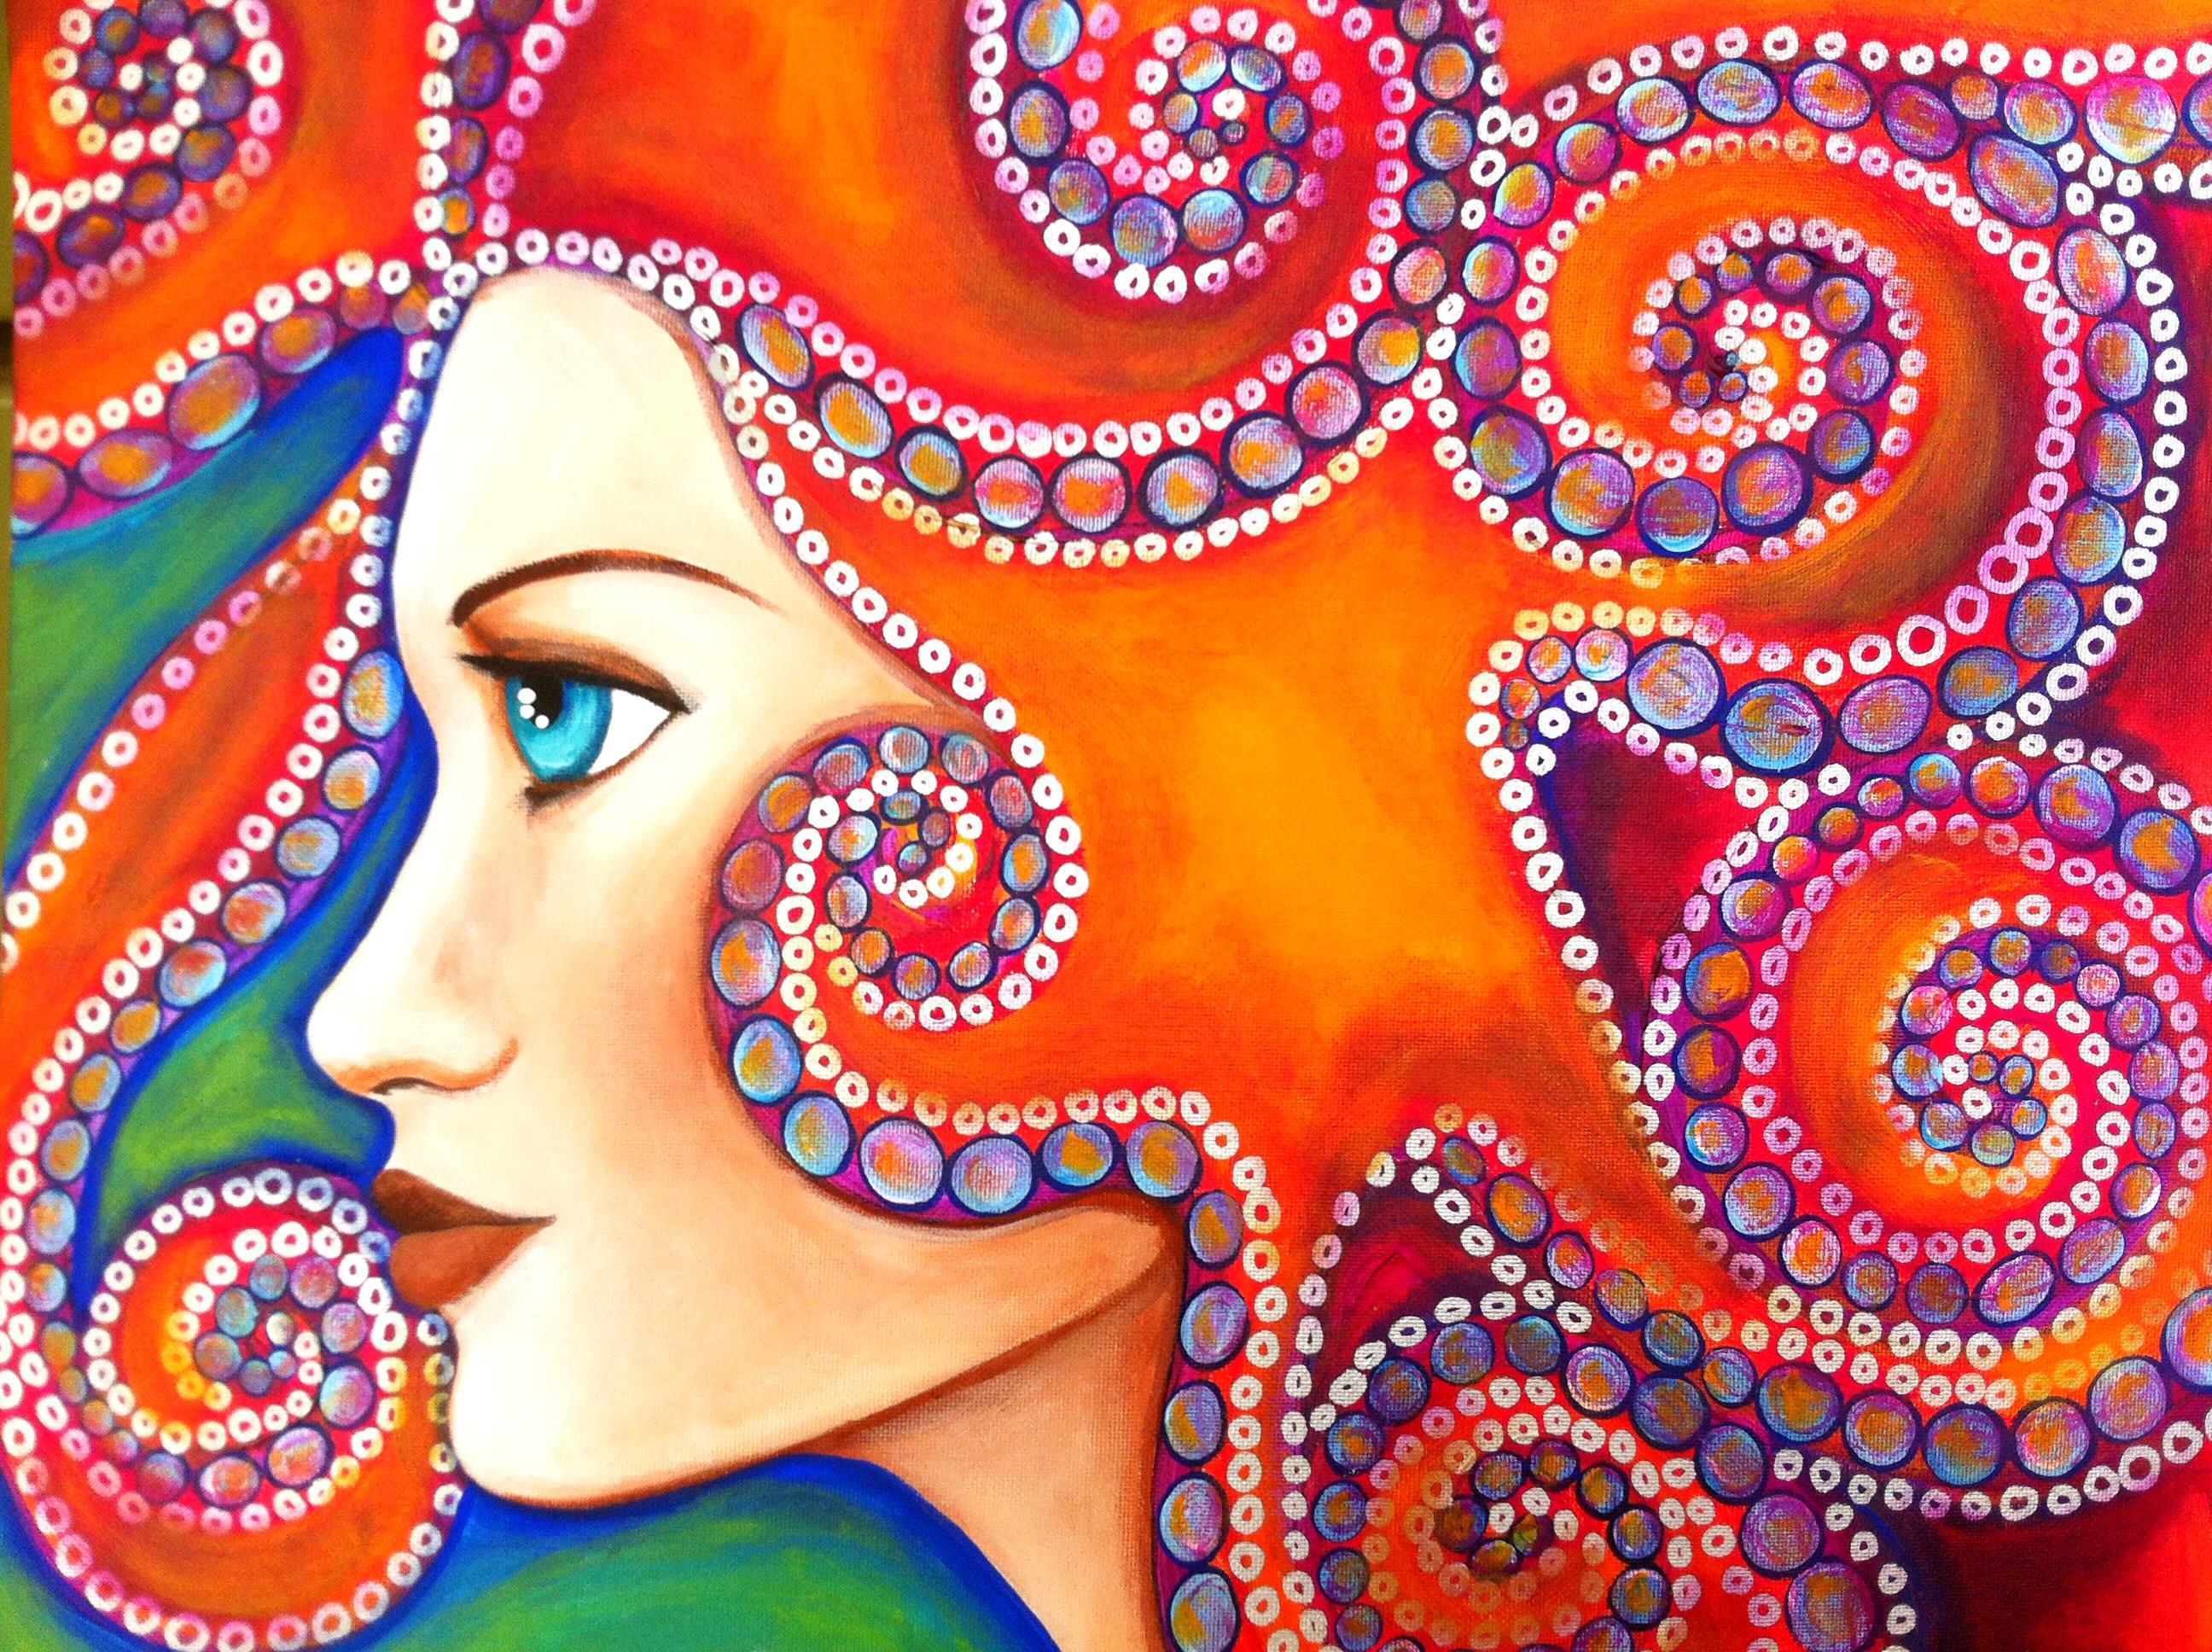 The strength of the feminine: Lewiston artist paints images of women, creates mosaics